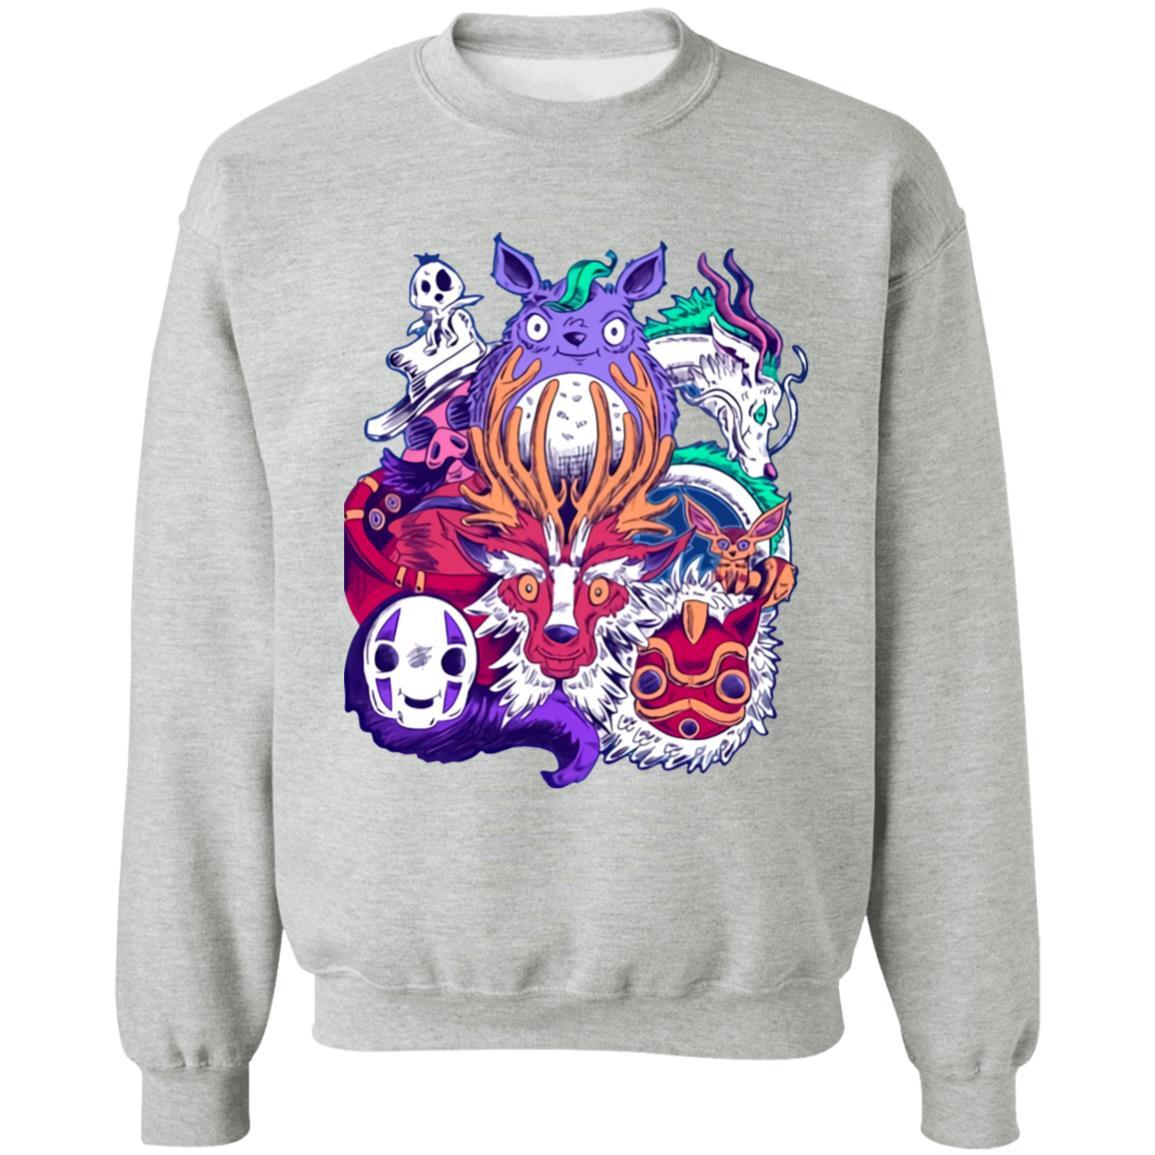 Ghibli Characters creepy style Sweatshirt